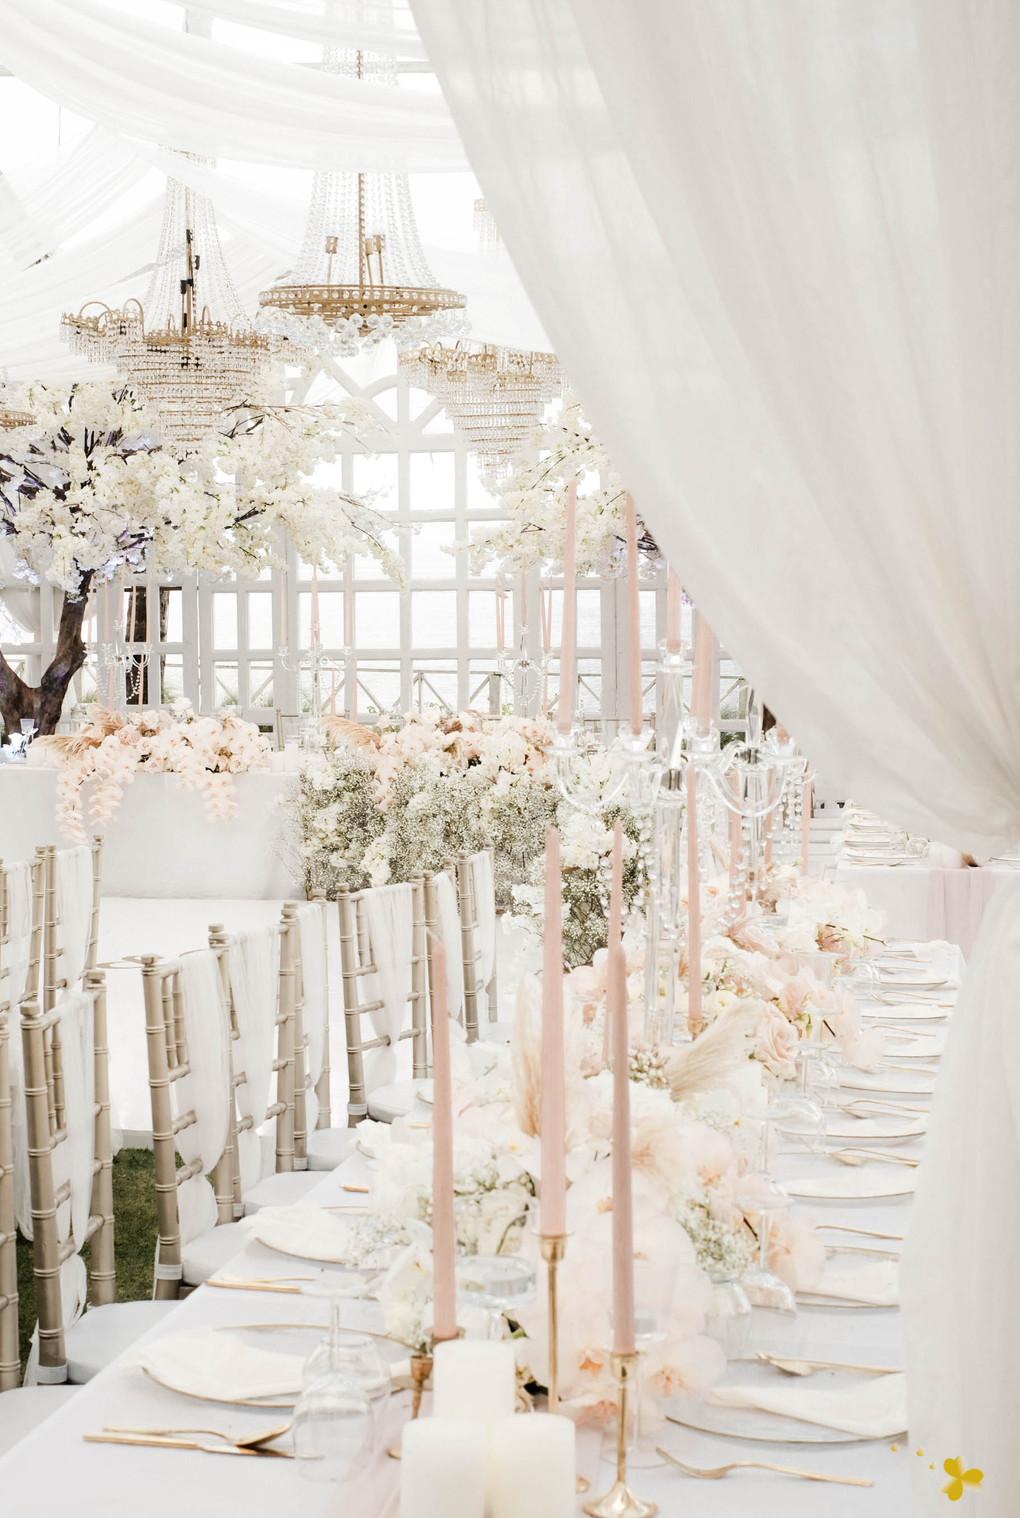 2019 Wedding Decor Trends According To Designmill Co